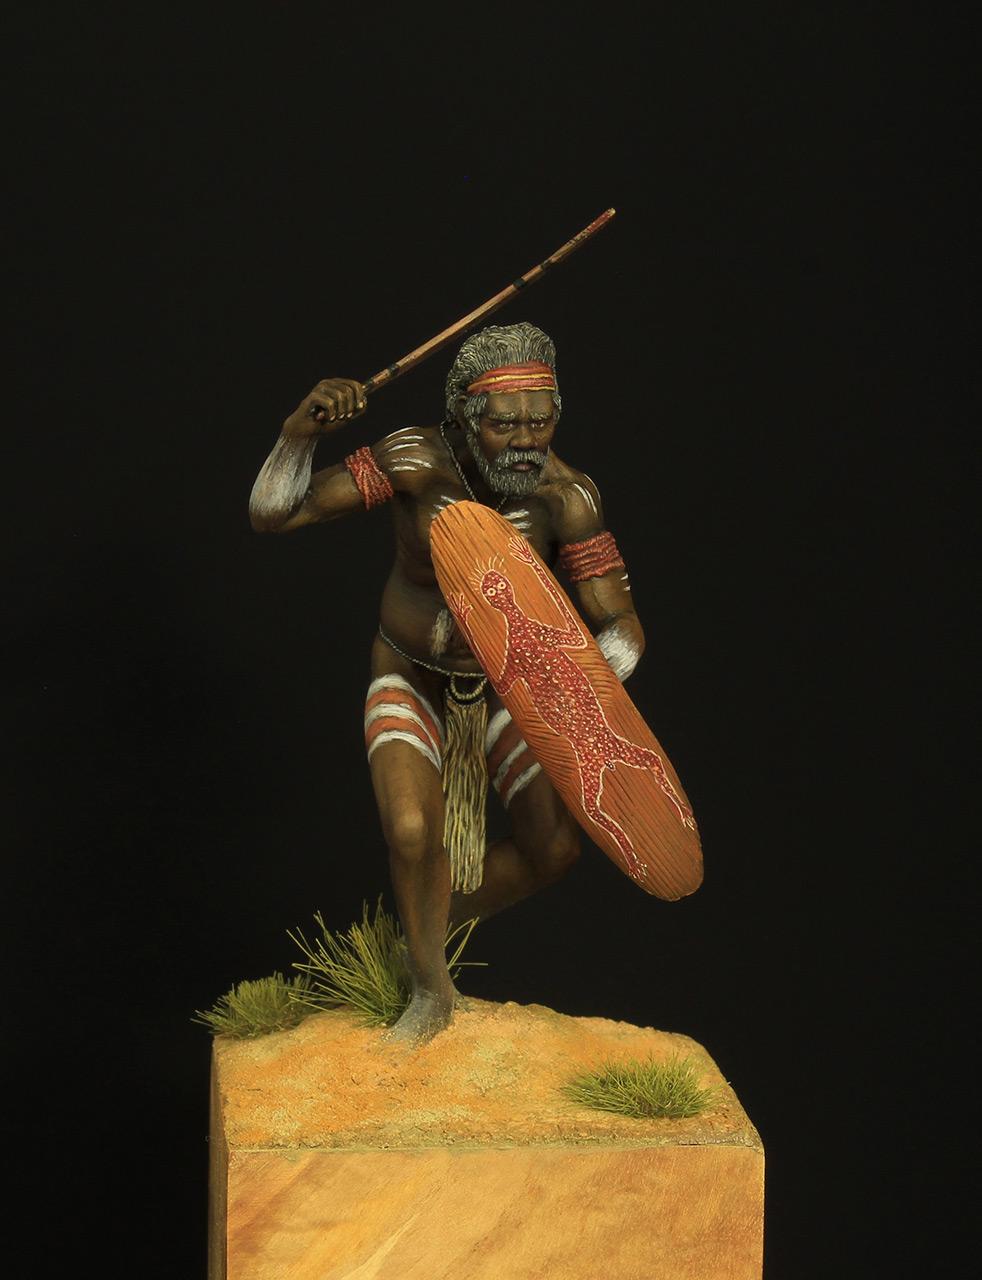 Figures: Australian aborigine, photo #1